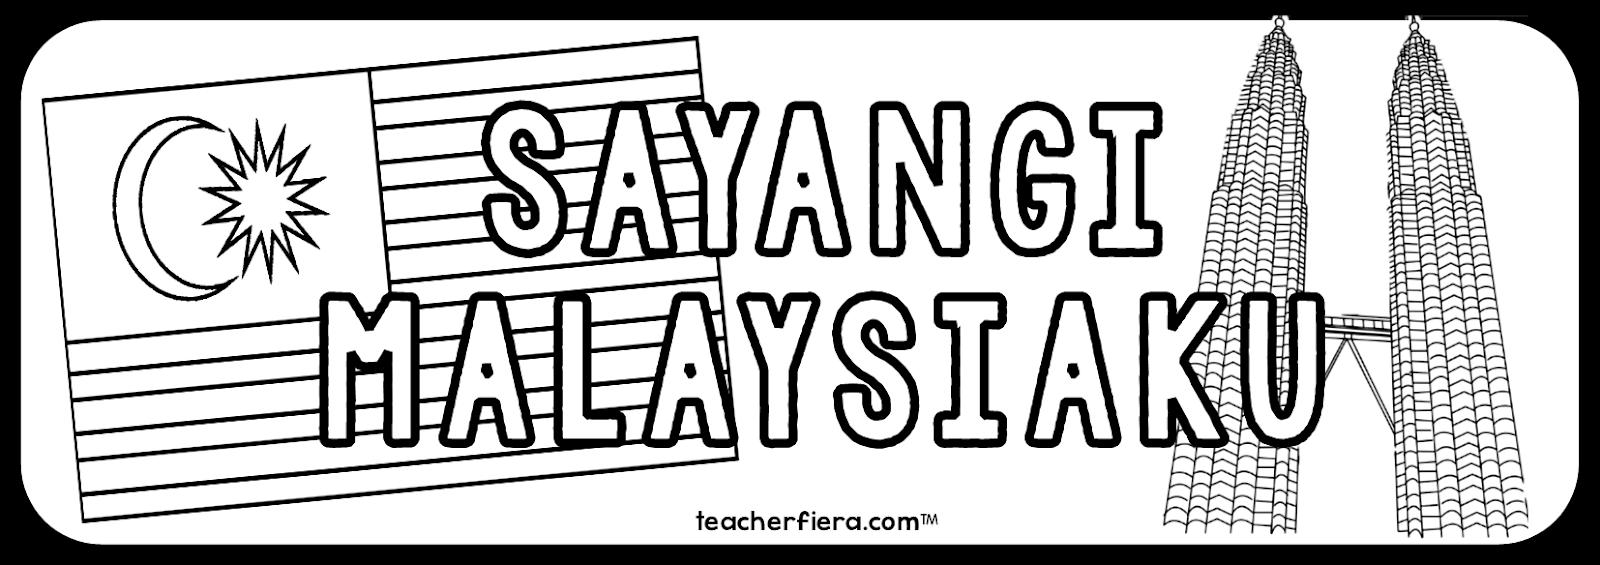 teacherfiera.com